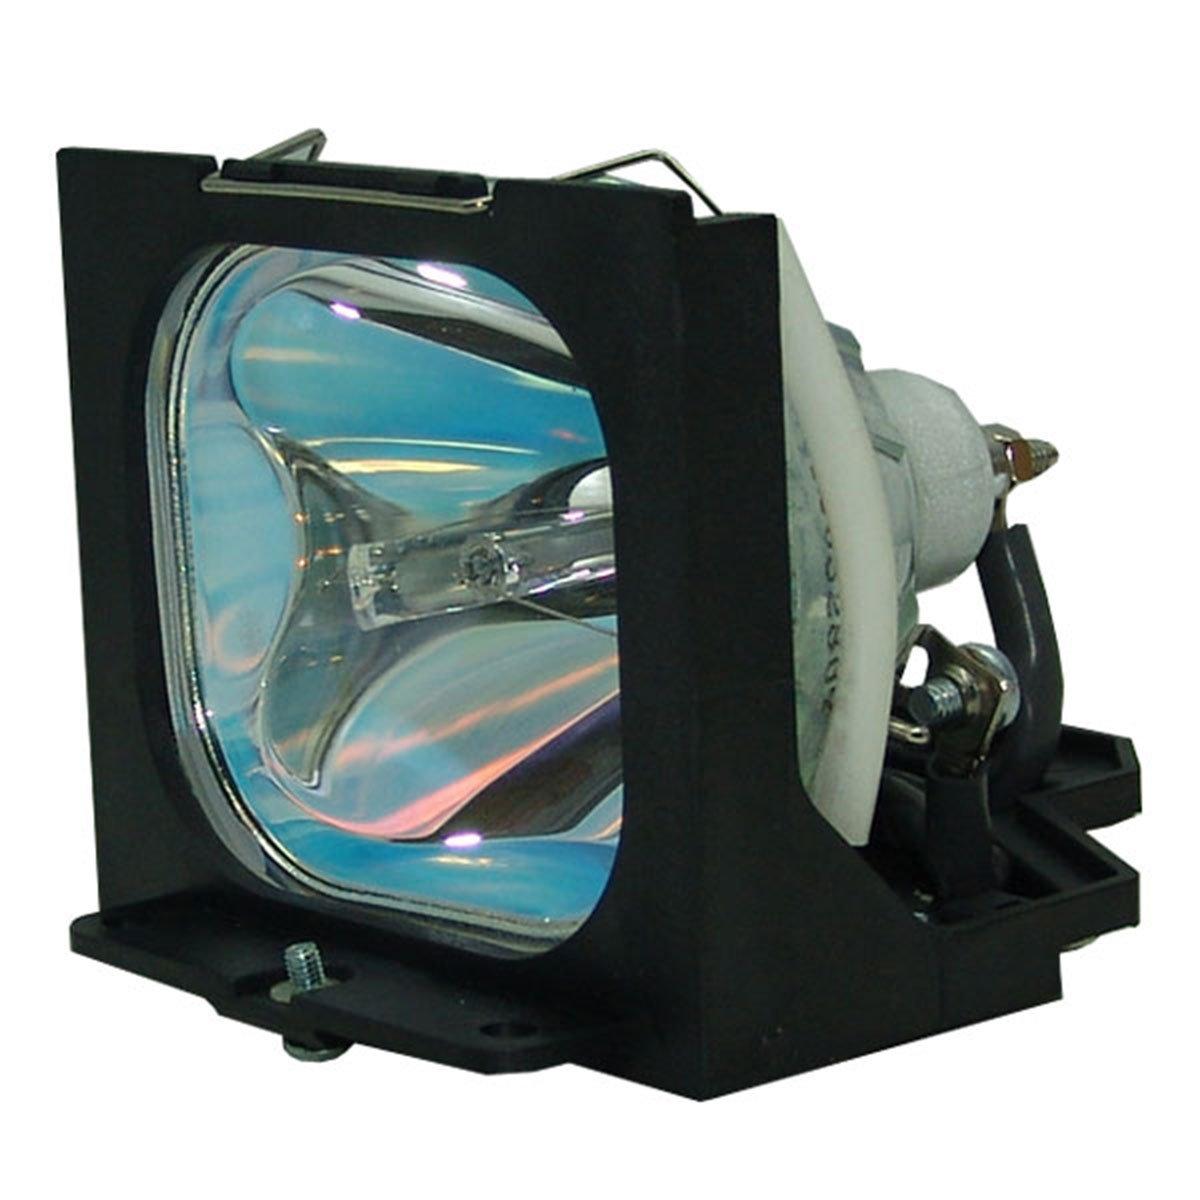 AuraBeam プロフェッショナル 東芝 TLP-670 プロジェクター交換用ランプ ハウジング付き (フィリップス製)   B0143LXV70